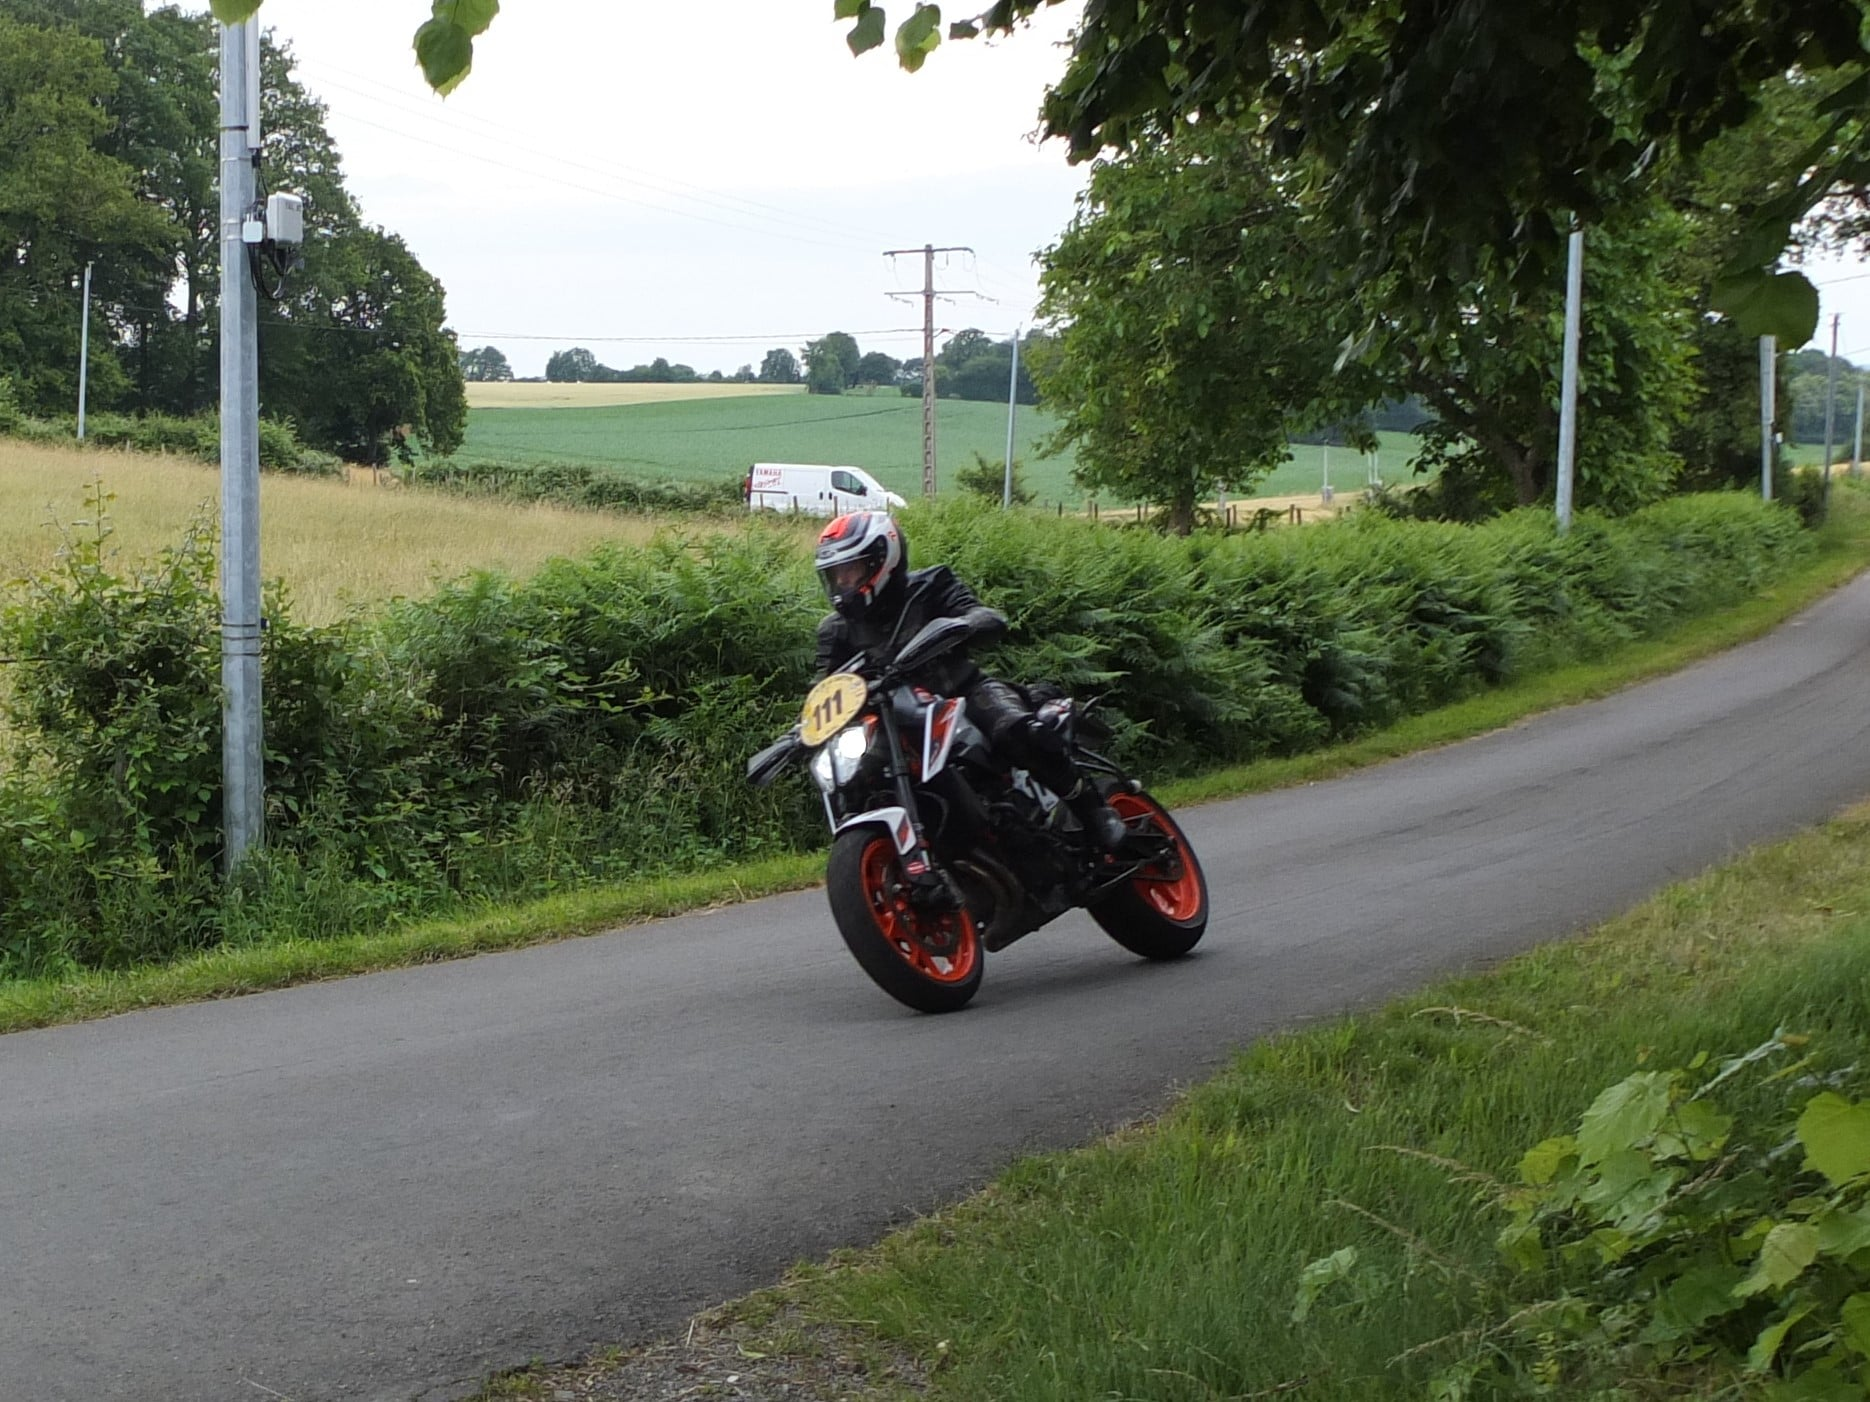 Davy GAMBINO, Rallye de la Sarthe, Championnat de France le 26 Juin 2021